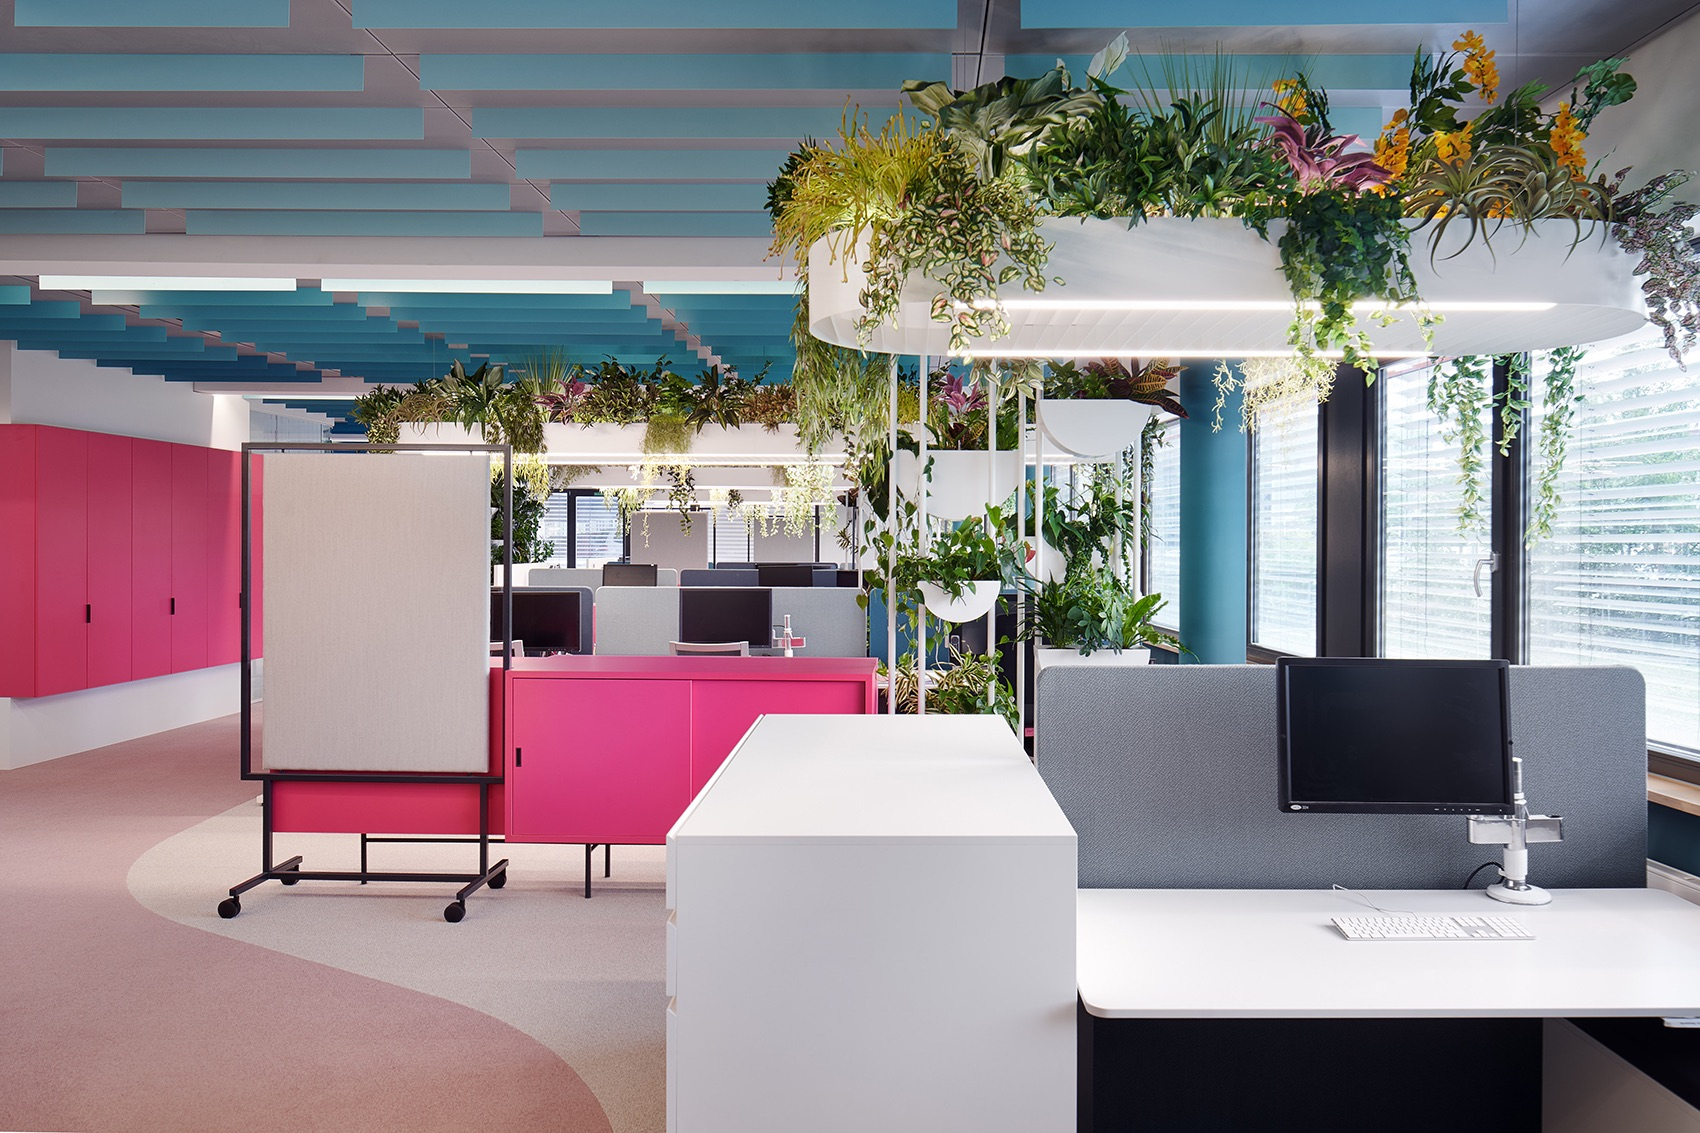 roman-klis-design-office-2